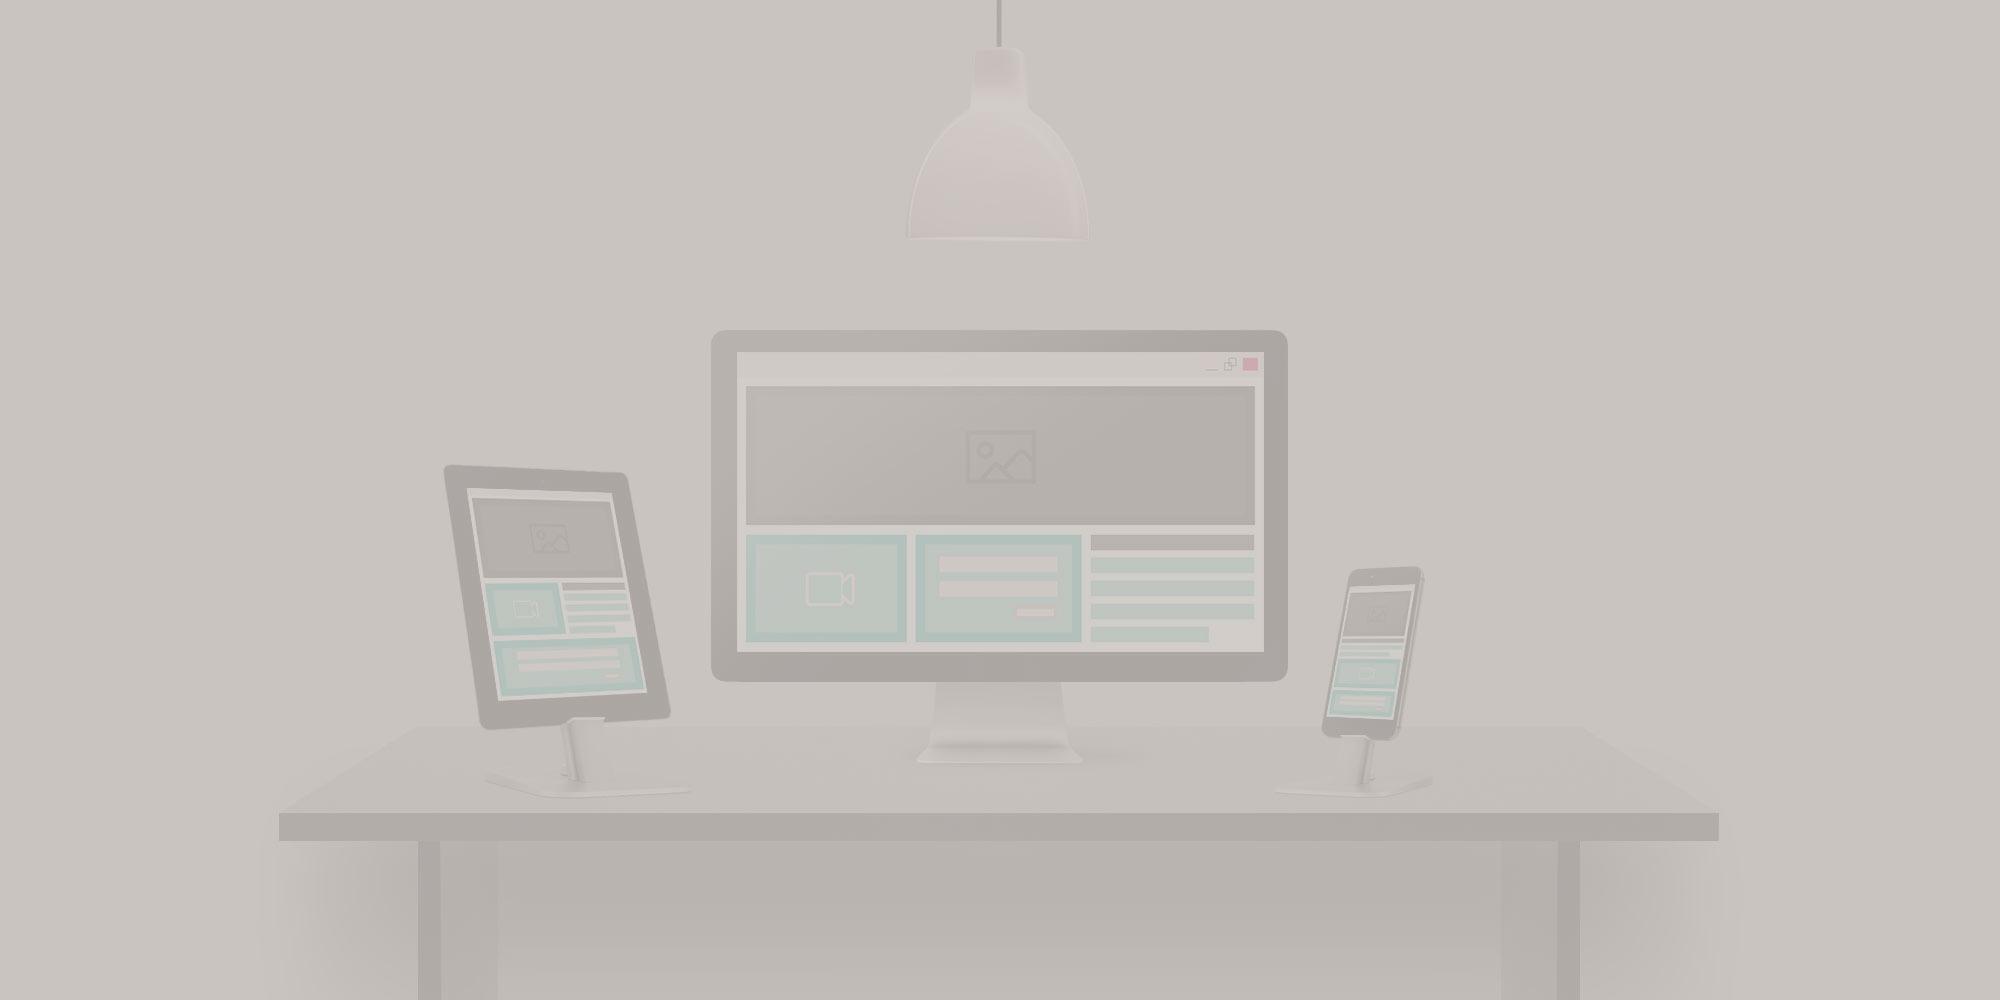 I want to build a new website: Should I use a theme or create a custom design?